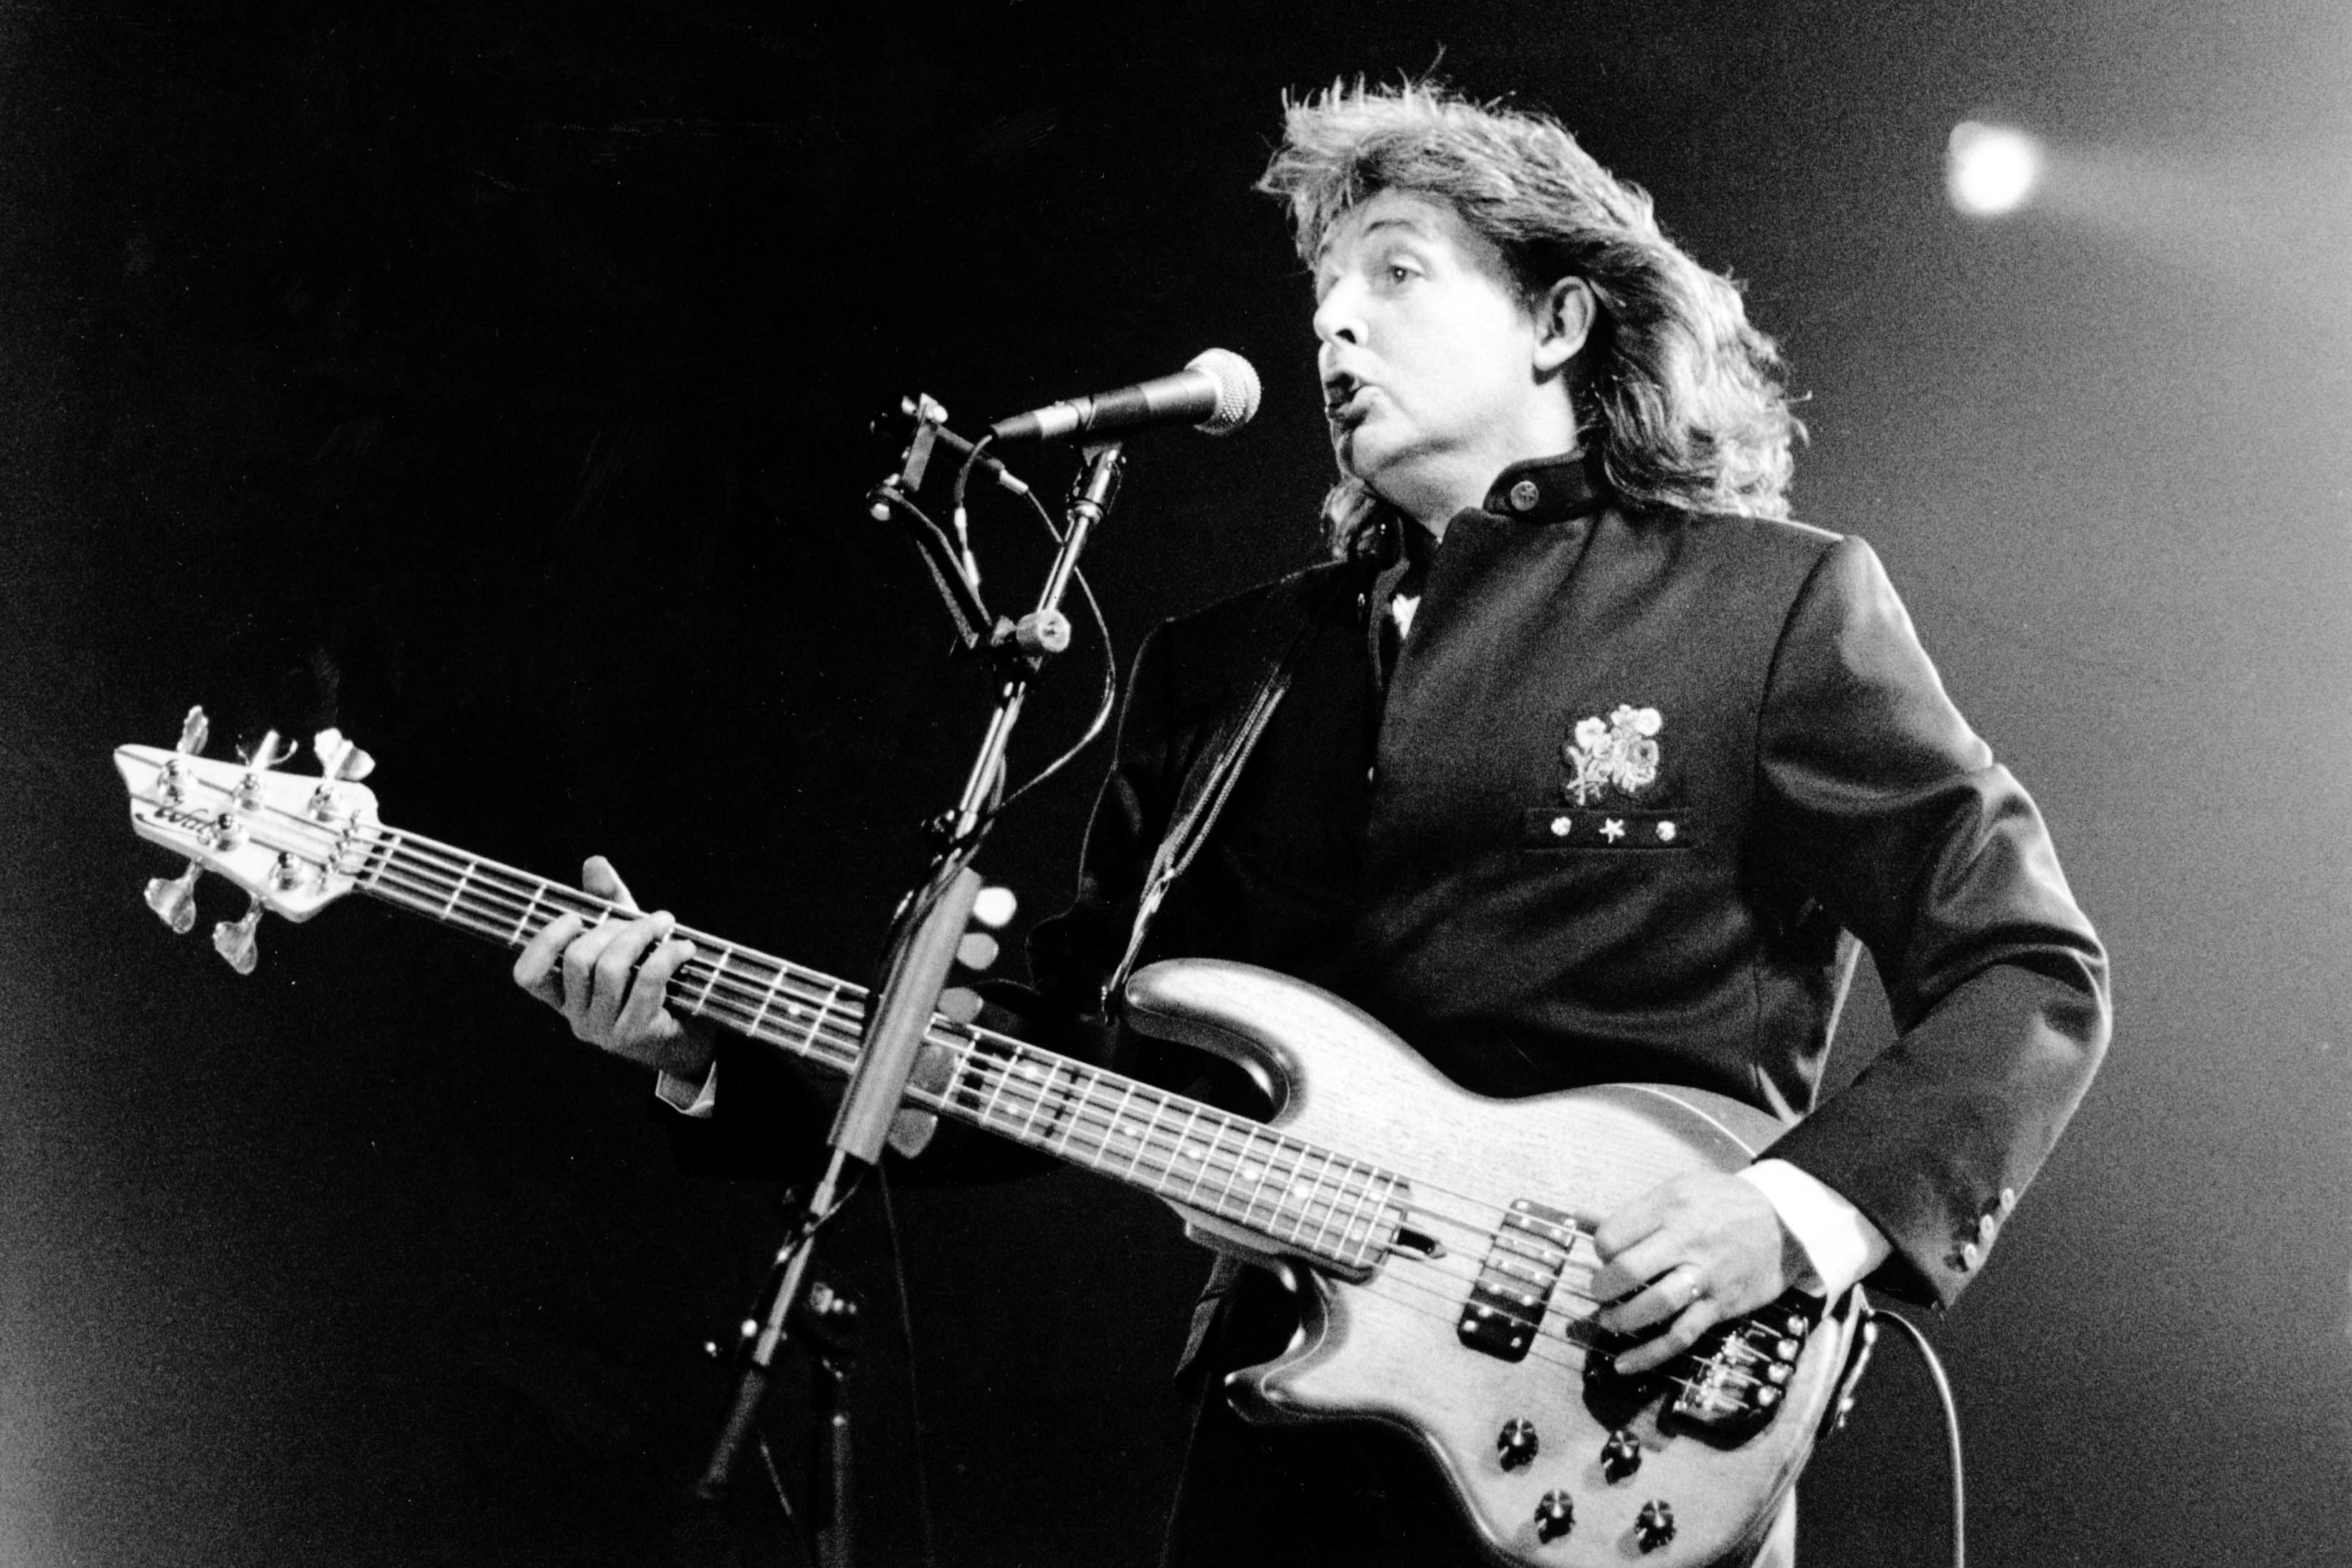 Watch Paul McCartney Play A Beatles Medley In 1989 Rolling Stone